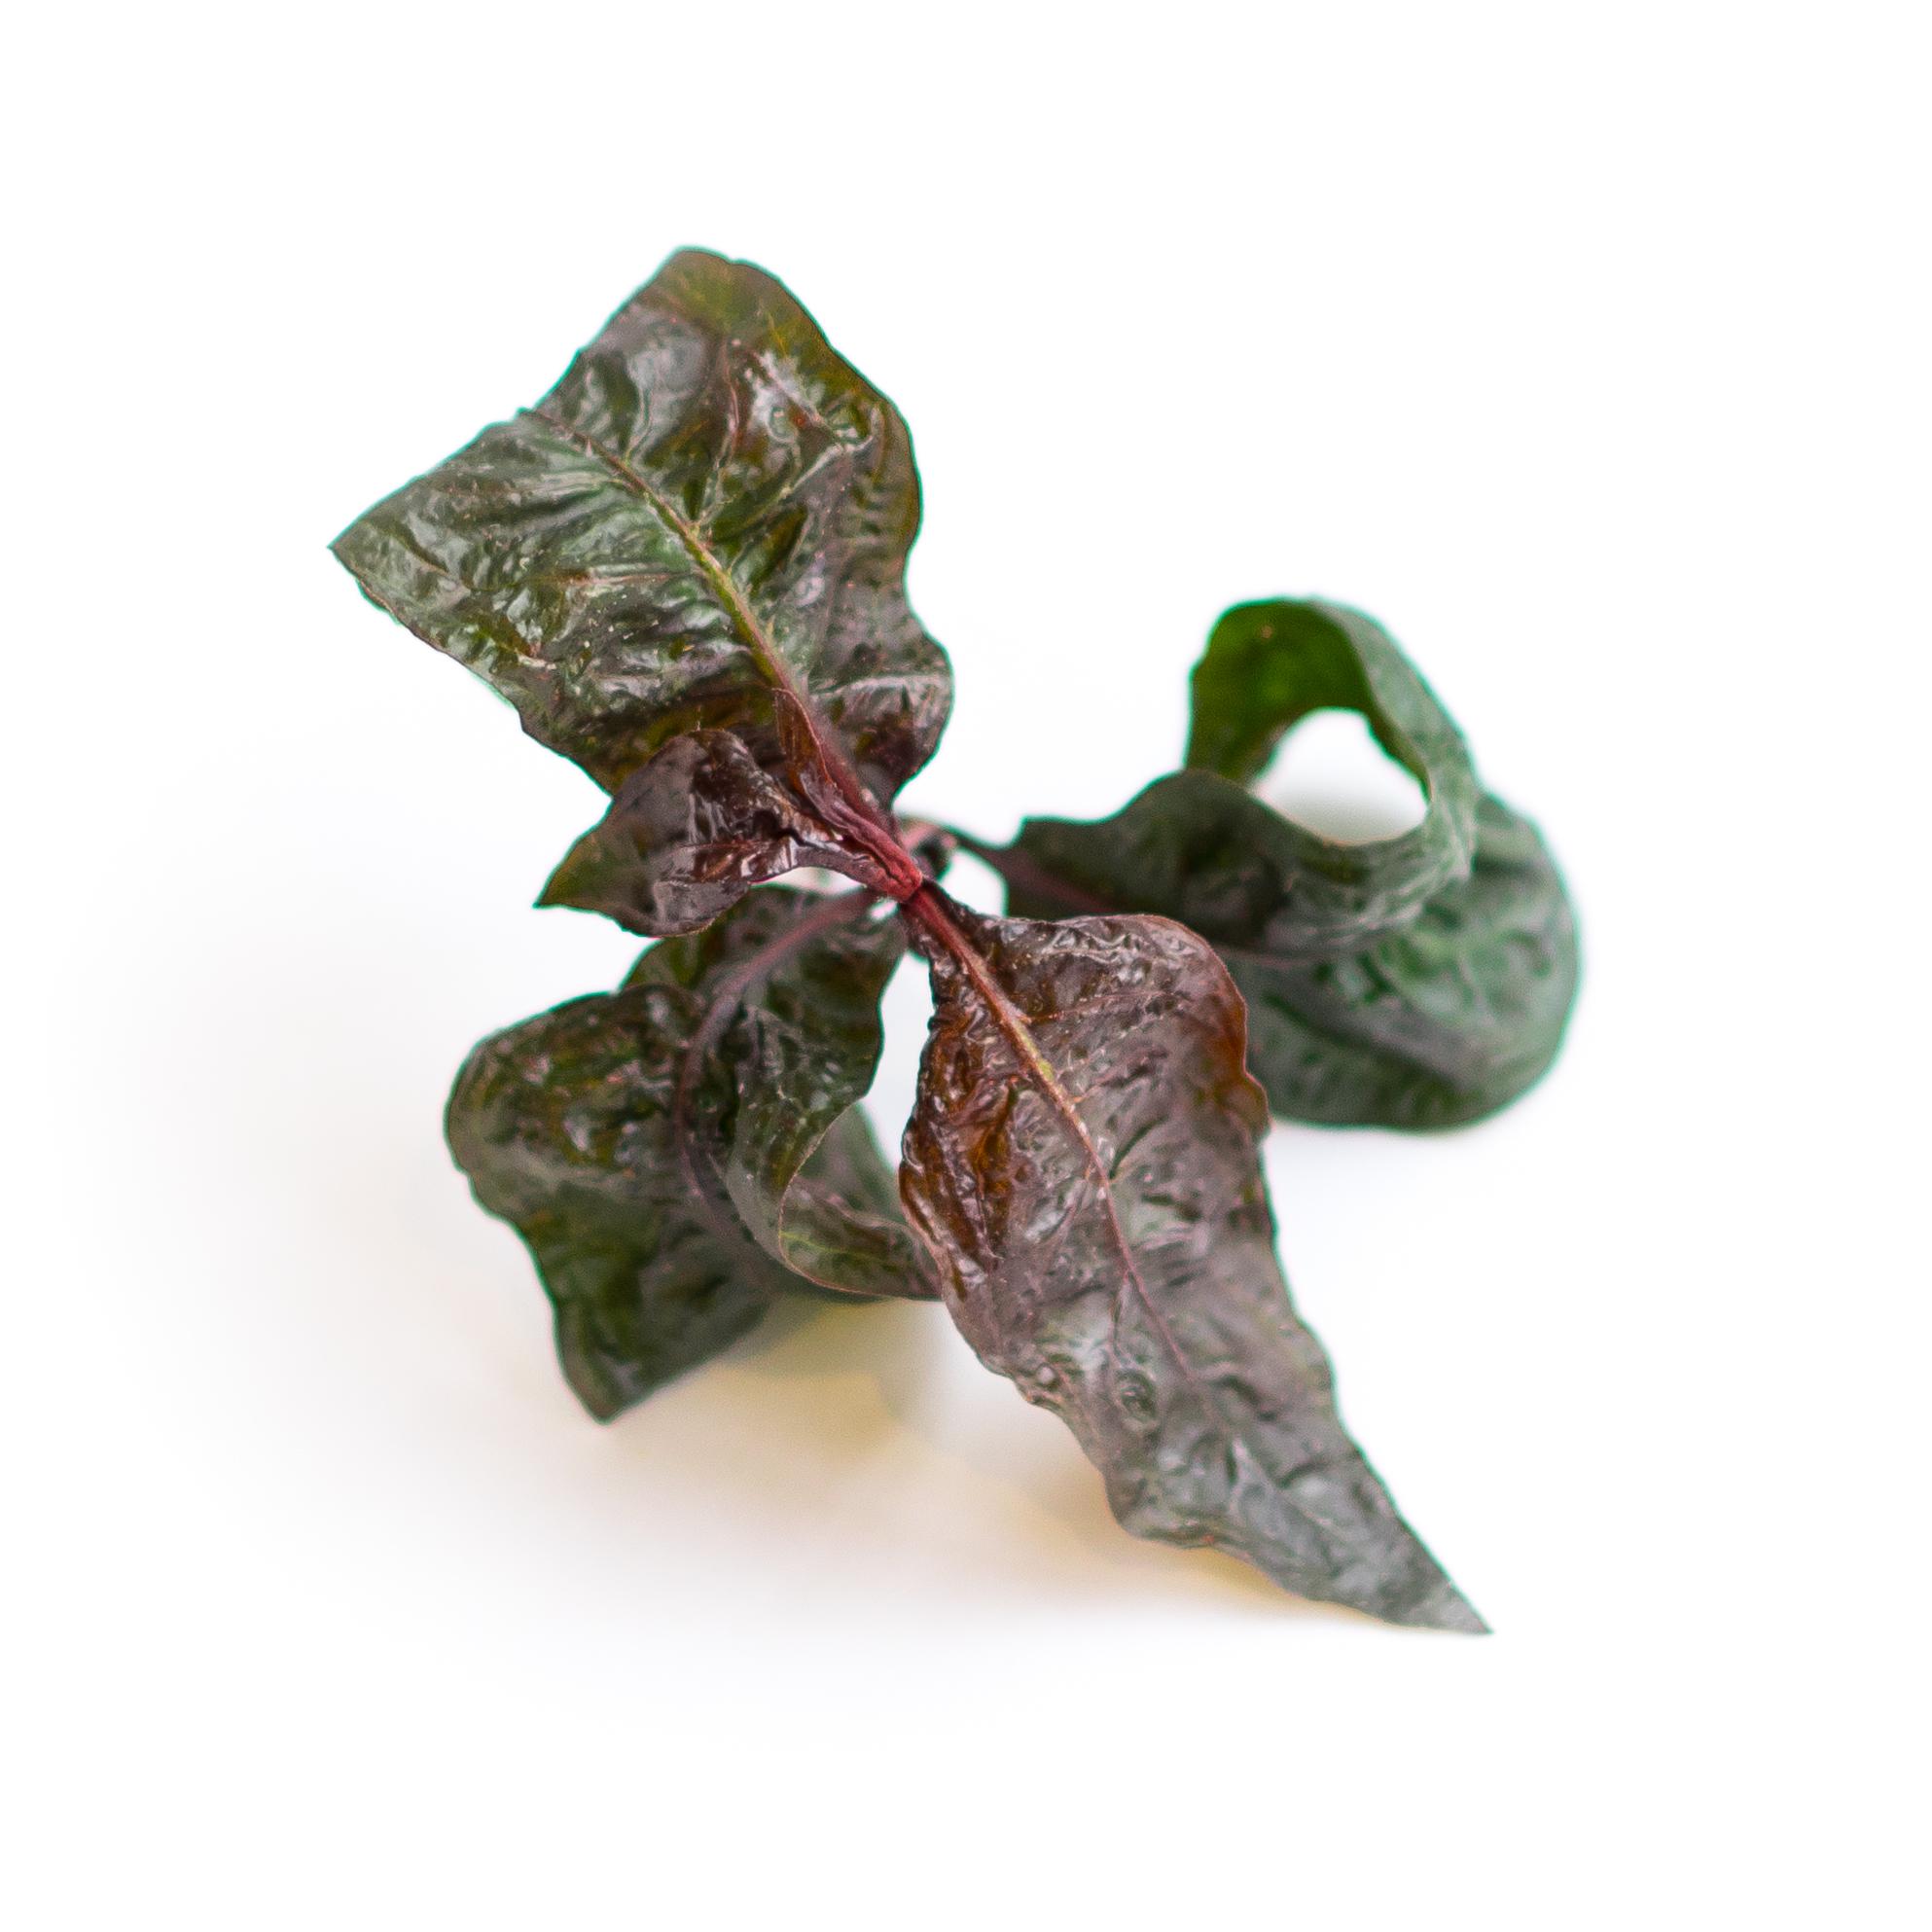 Akatade (Water Pepper)